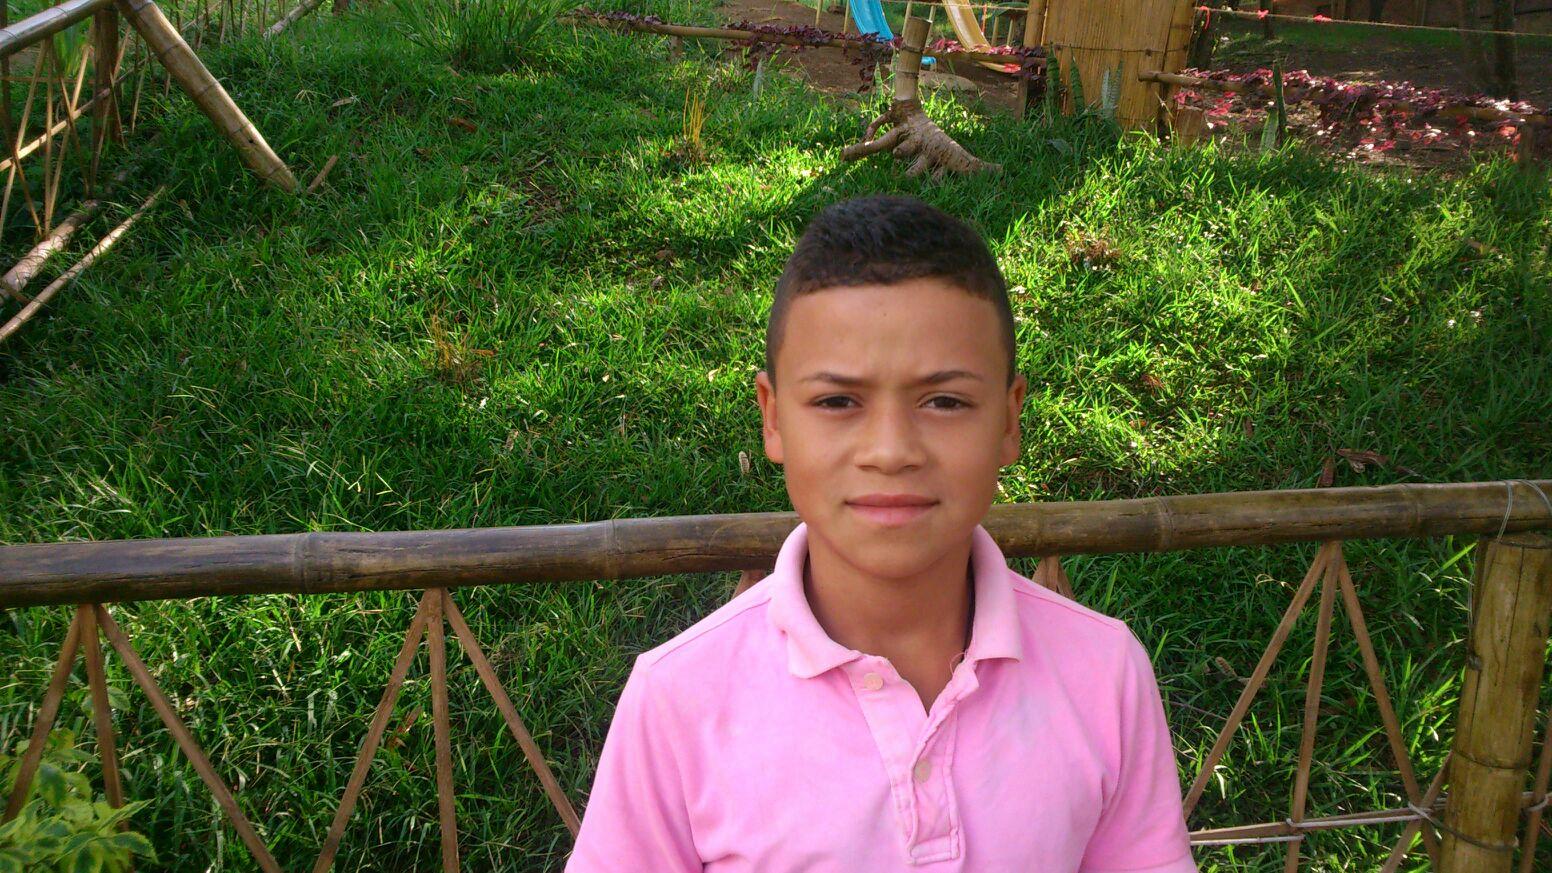 Aaron Valencia, Schüler am Colegio de las Aguas Montebello<br /><em>&#8222;Meine Geschichte&#8220;</em>